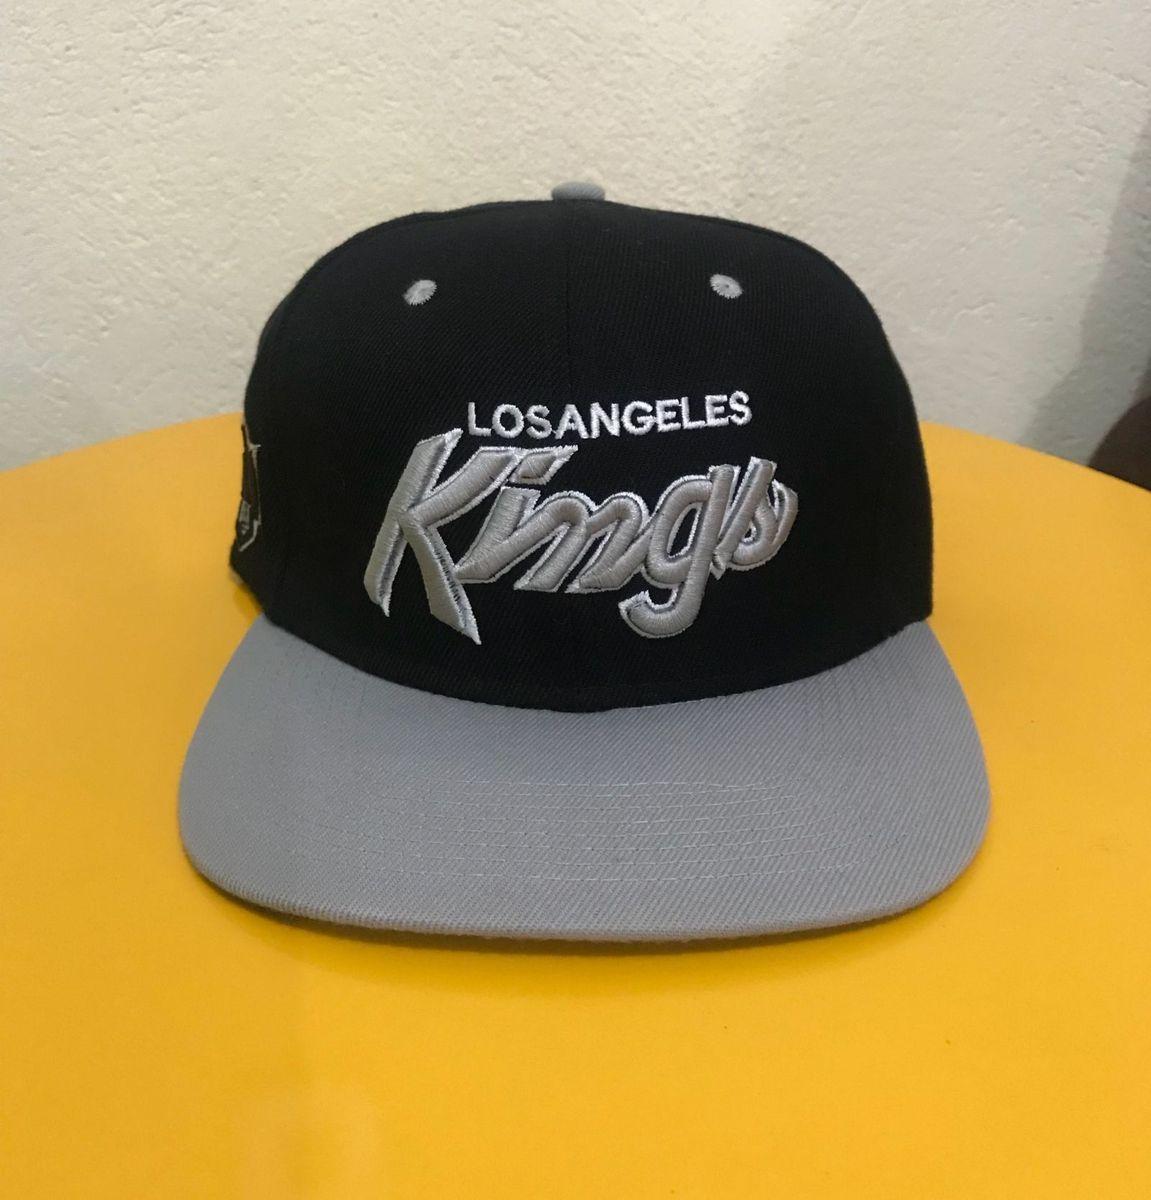 boné los angeles kings nfl - zephyr the z hat - bonés nfl 0a582c08992